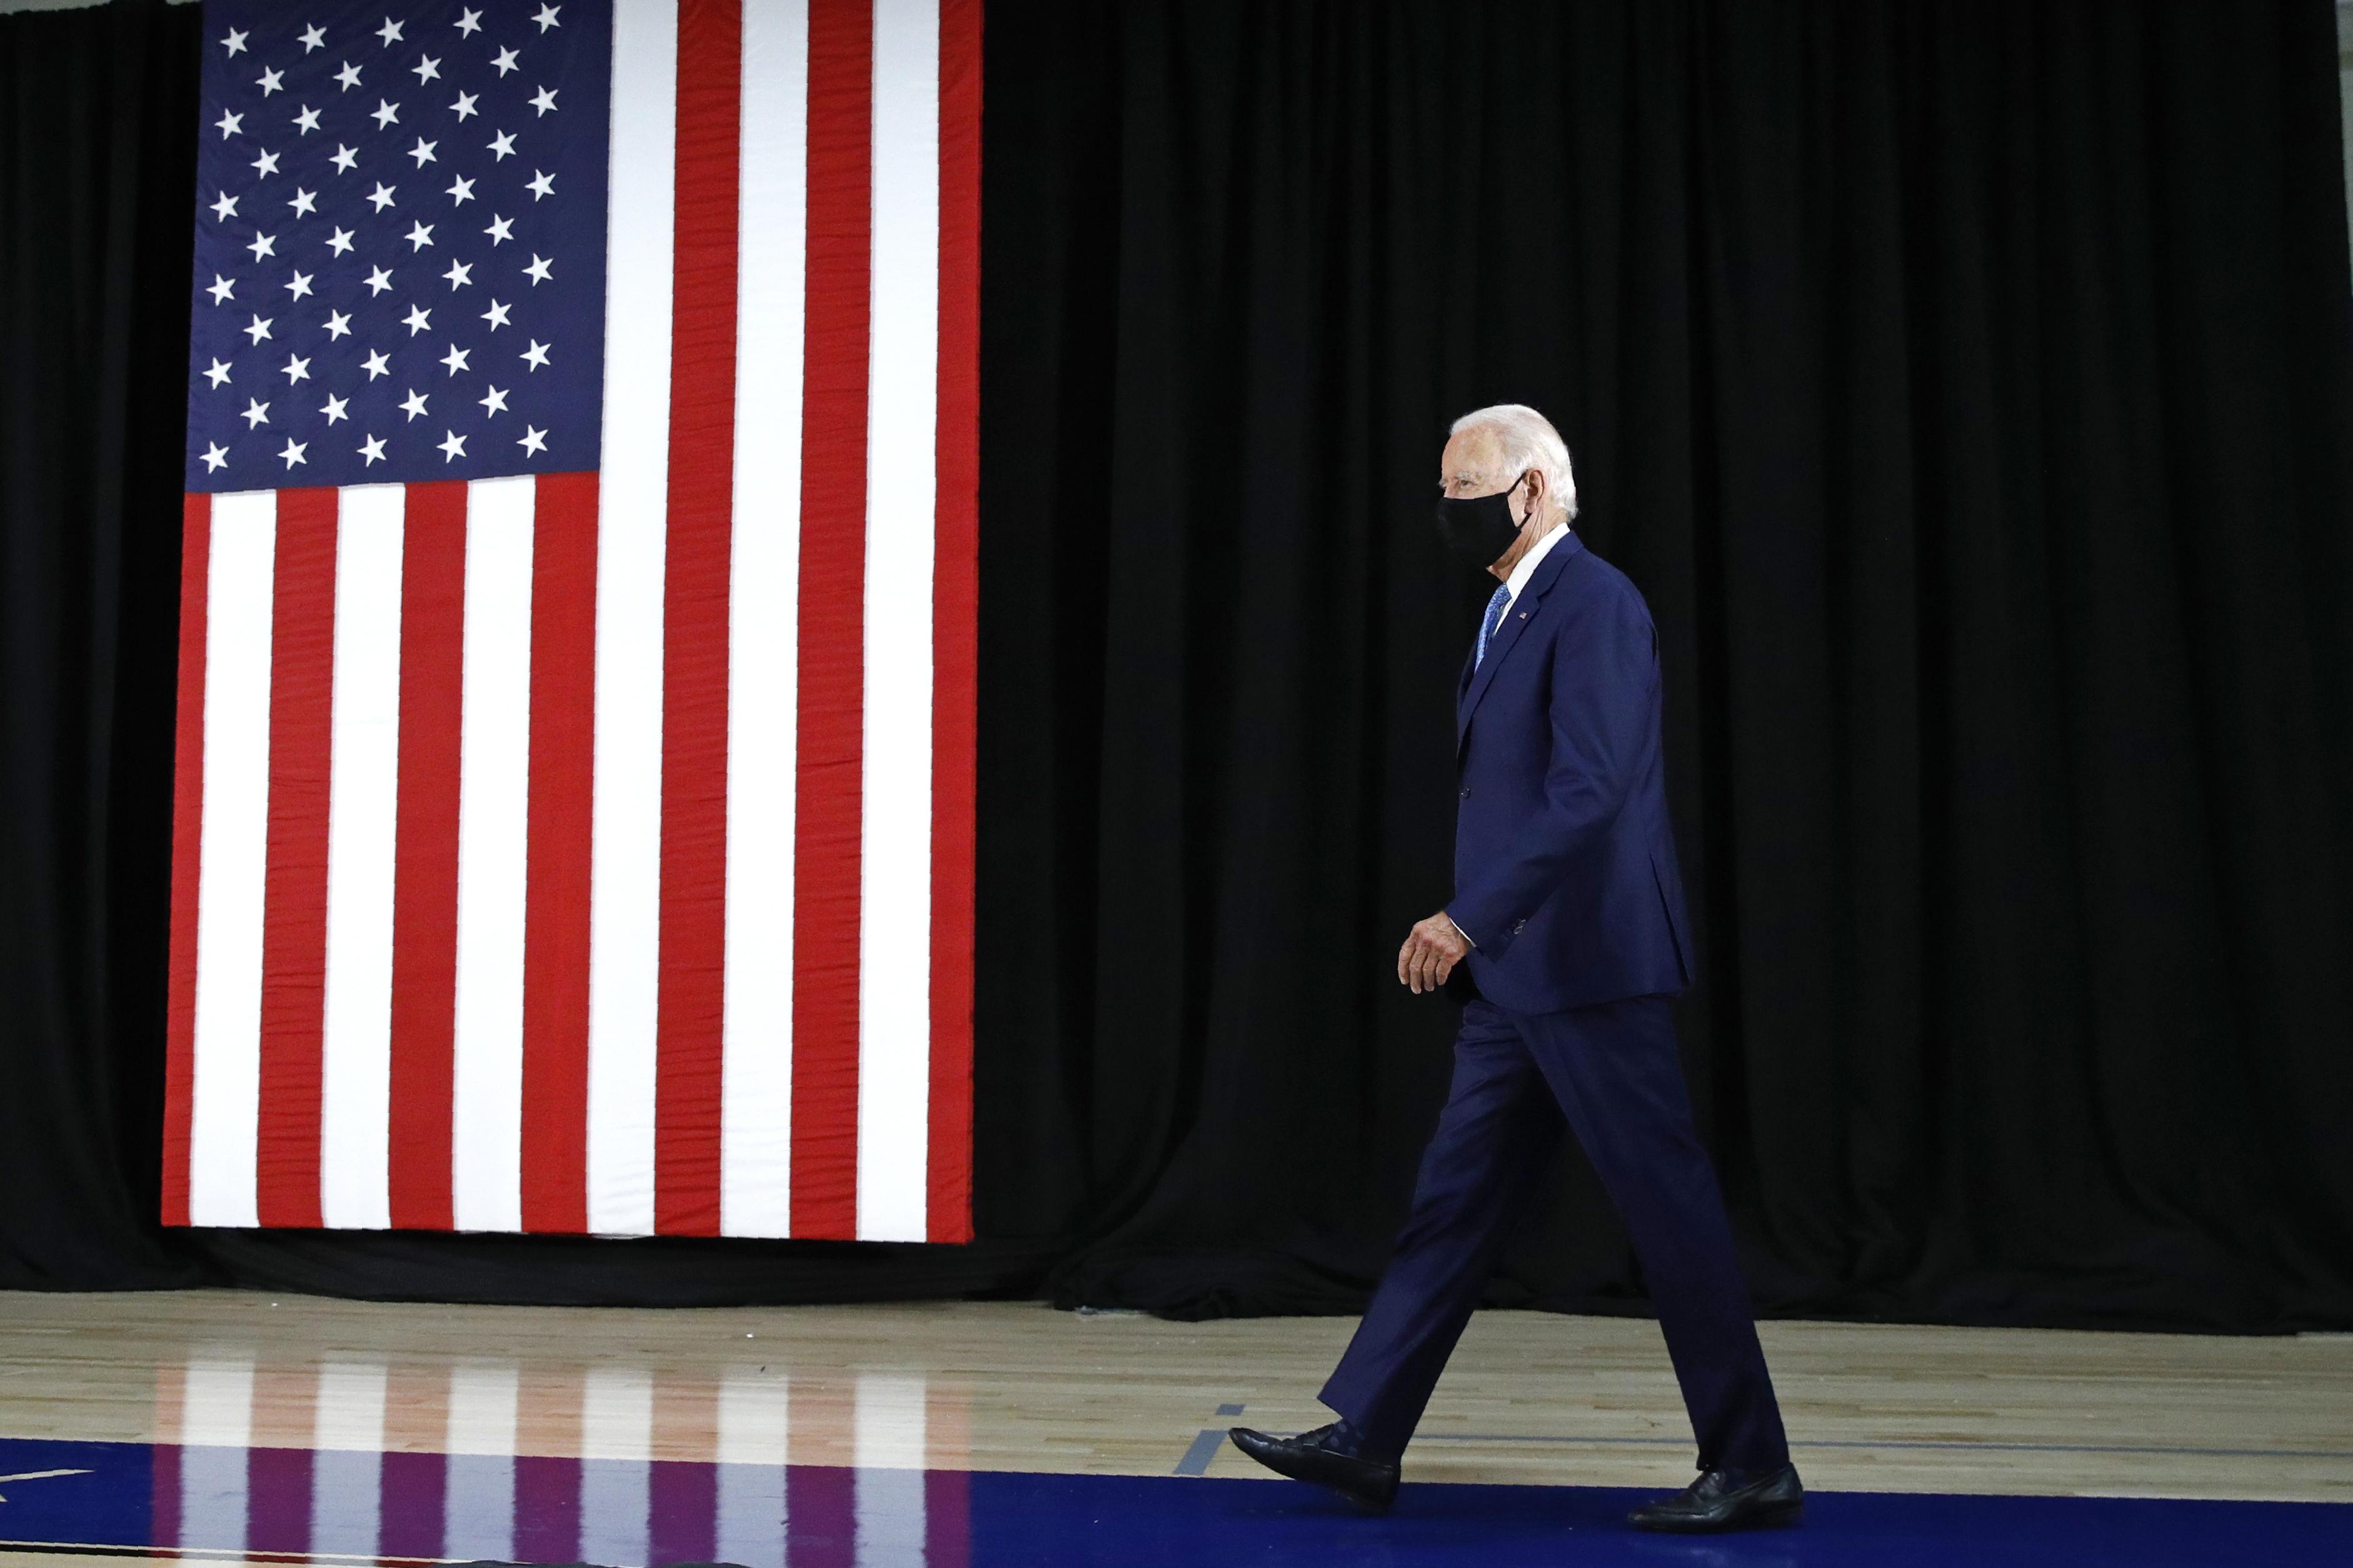 Democratic presidential candidate, former Vice President Joe Biden arrives to speak at Alexis Dupont High School in Wilmington, Del., Tuesday, June 30, 2020. (AP Photo/Patrick Semansky)